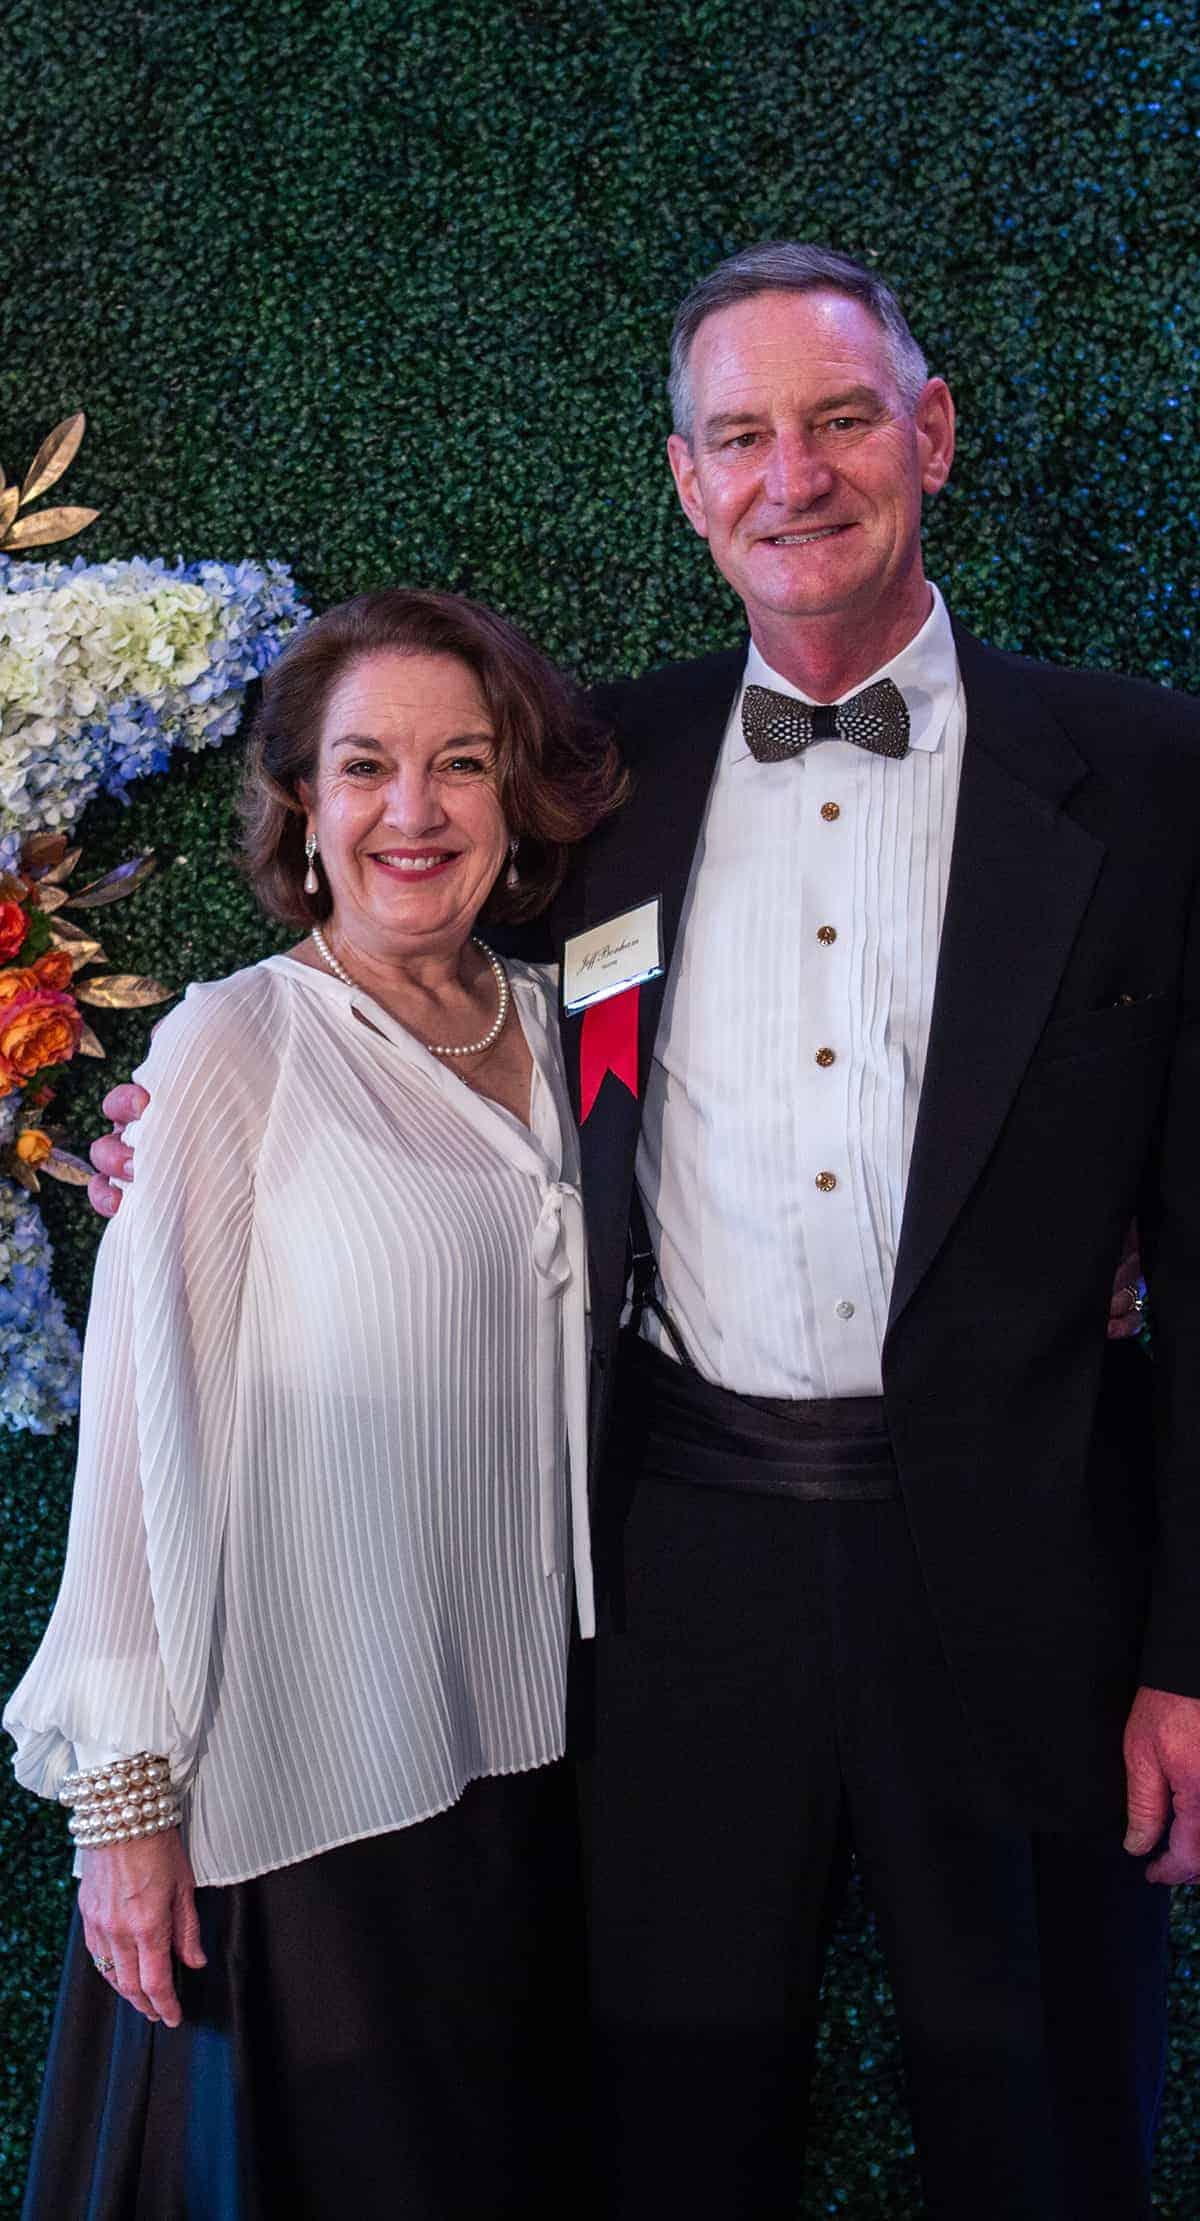 Bob Bullock Gala on April 20, 2021 in Austin, Texas.